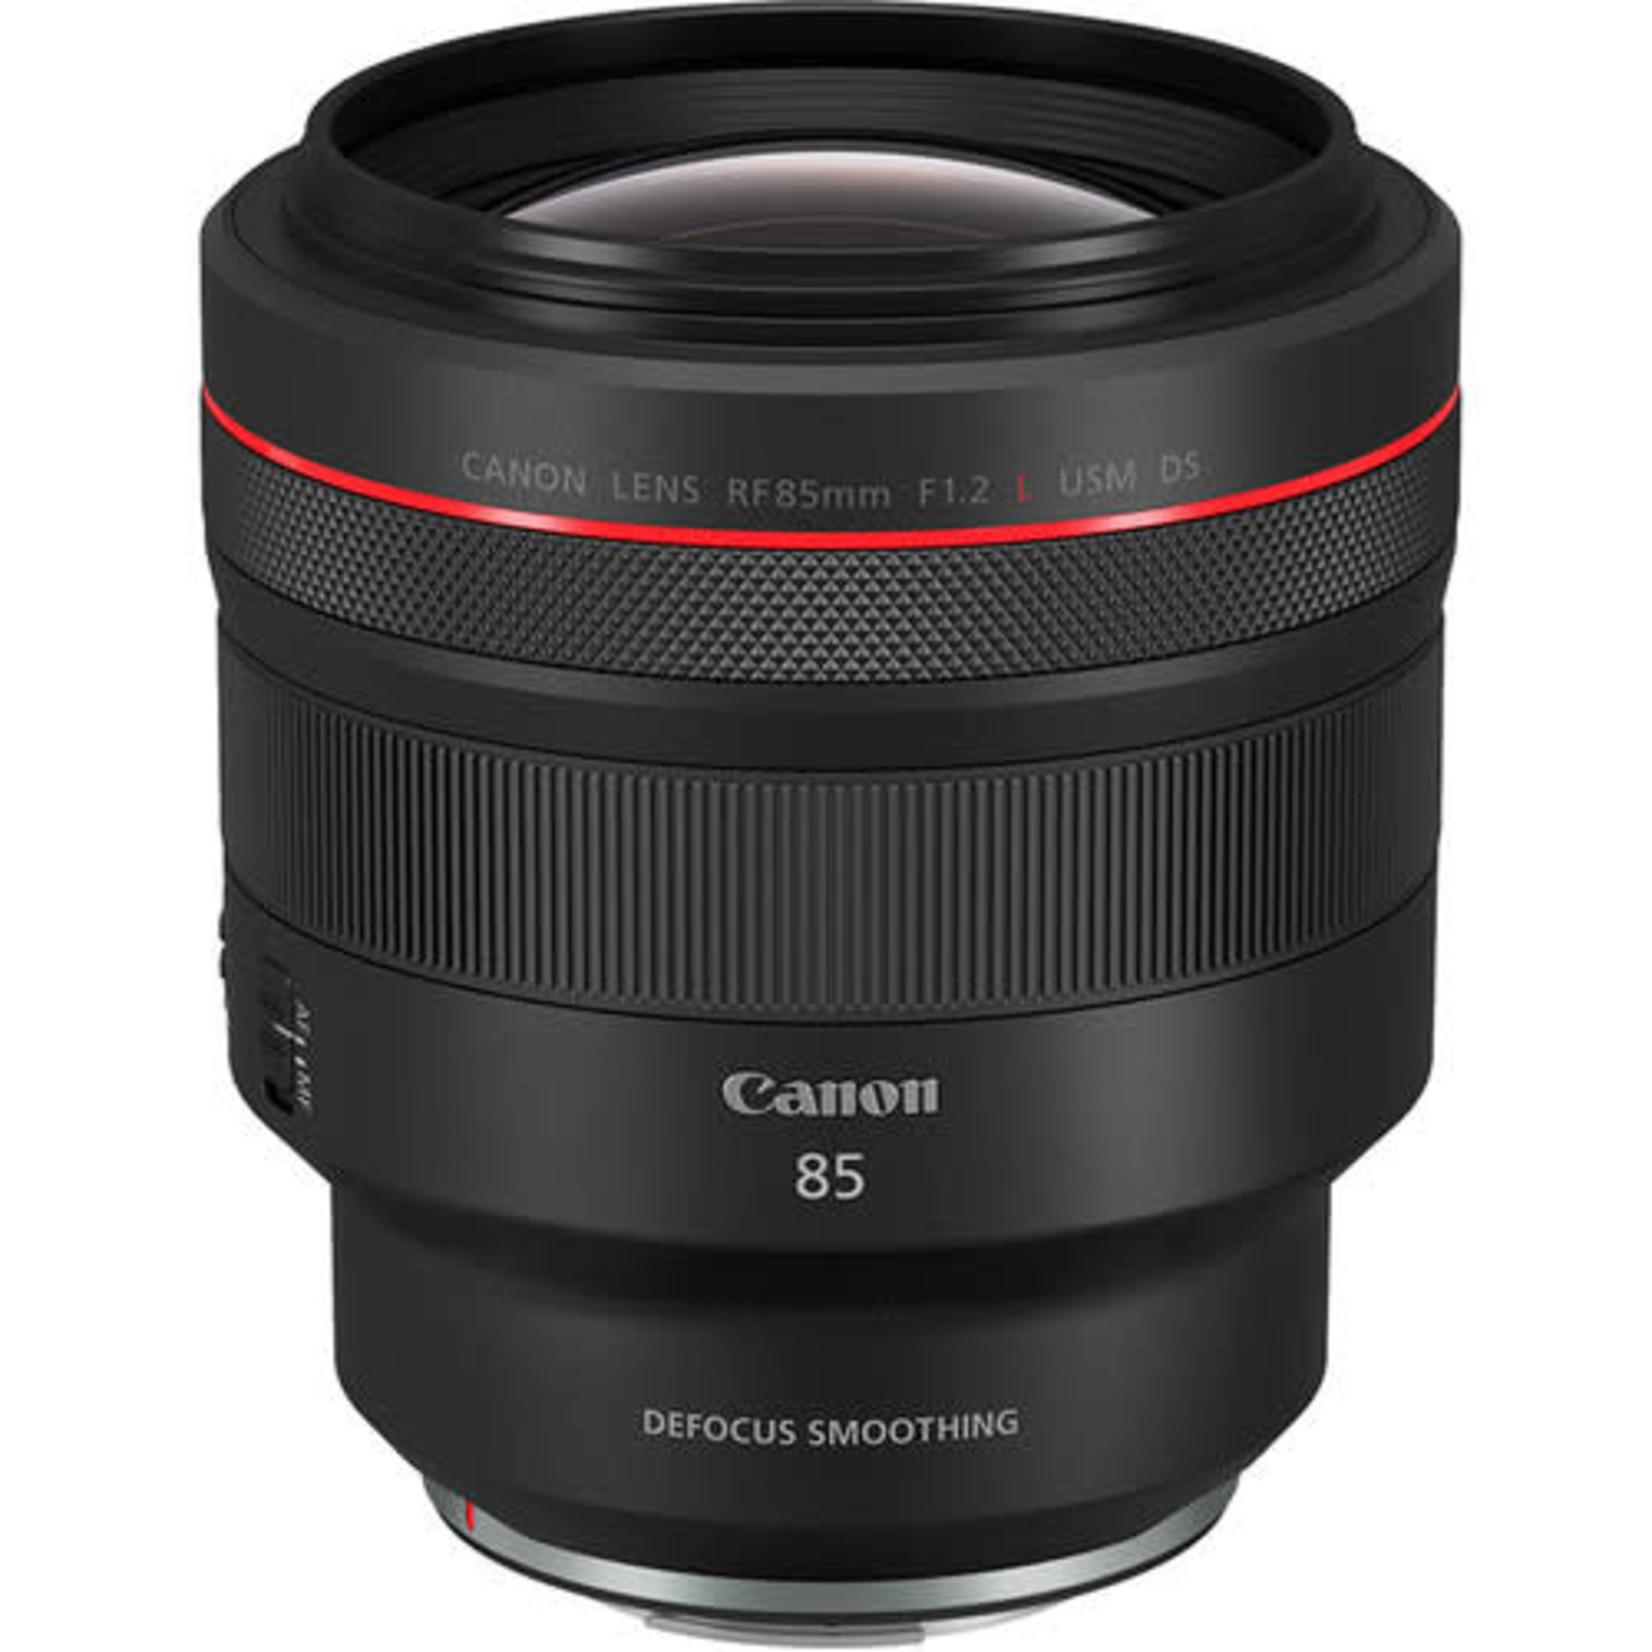 Canon Canon RF 85mm f/1.2L USM DS Lens